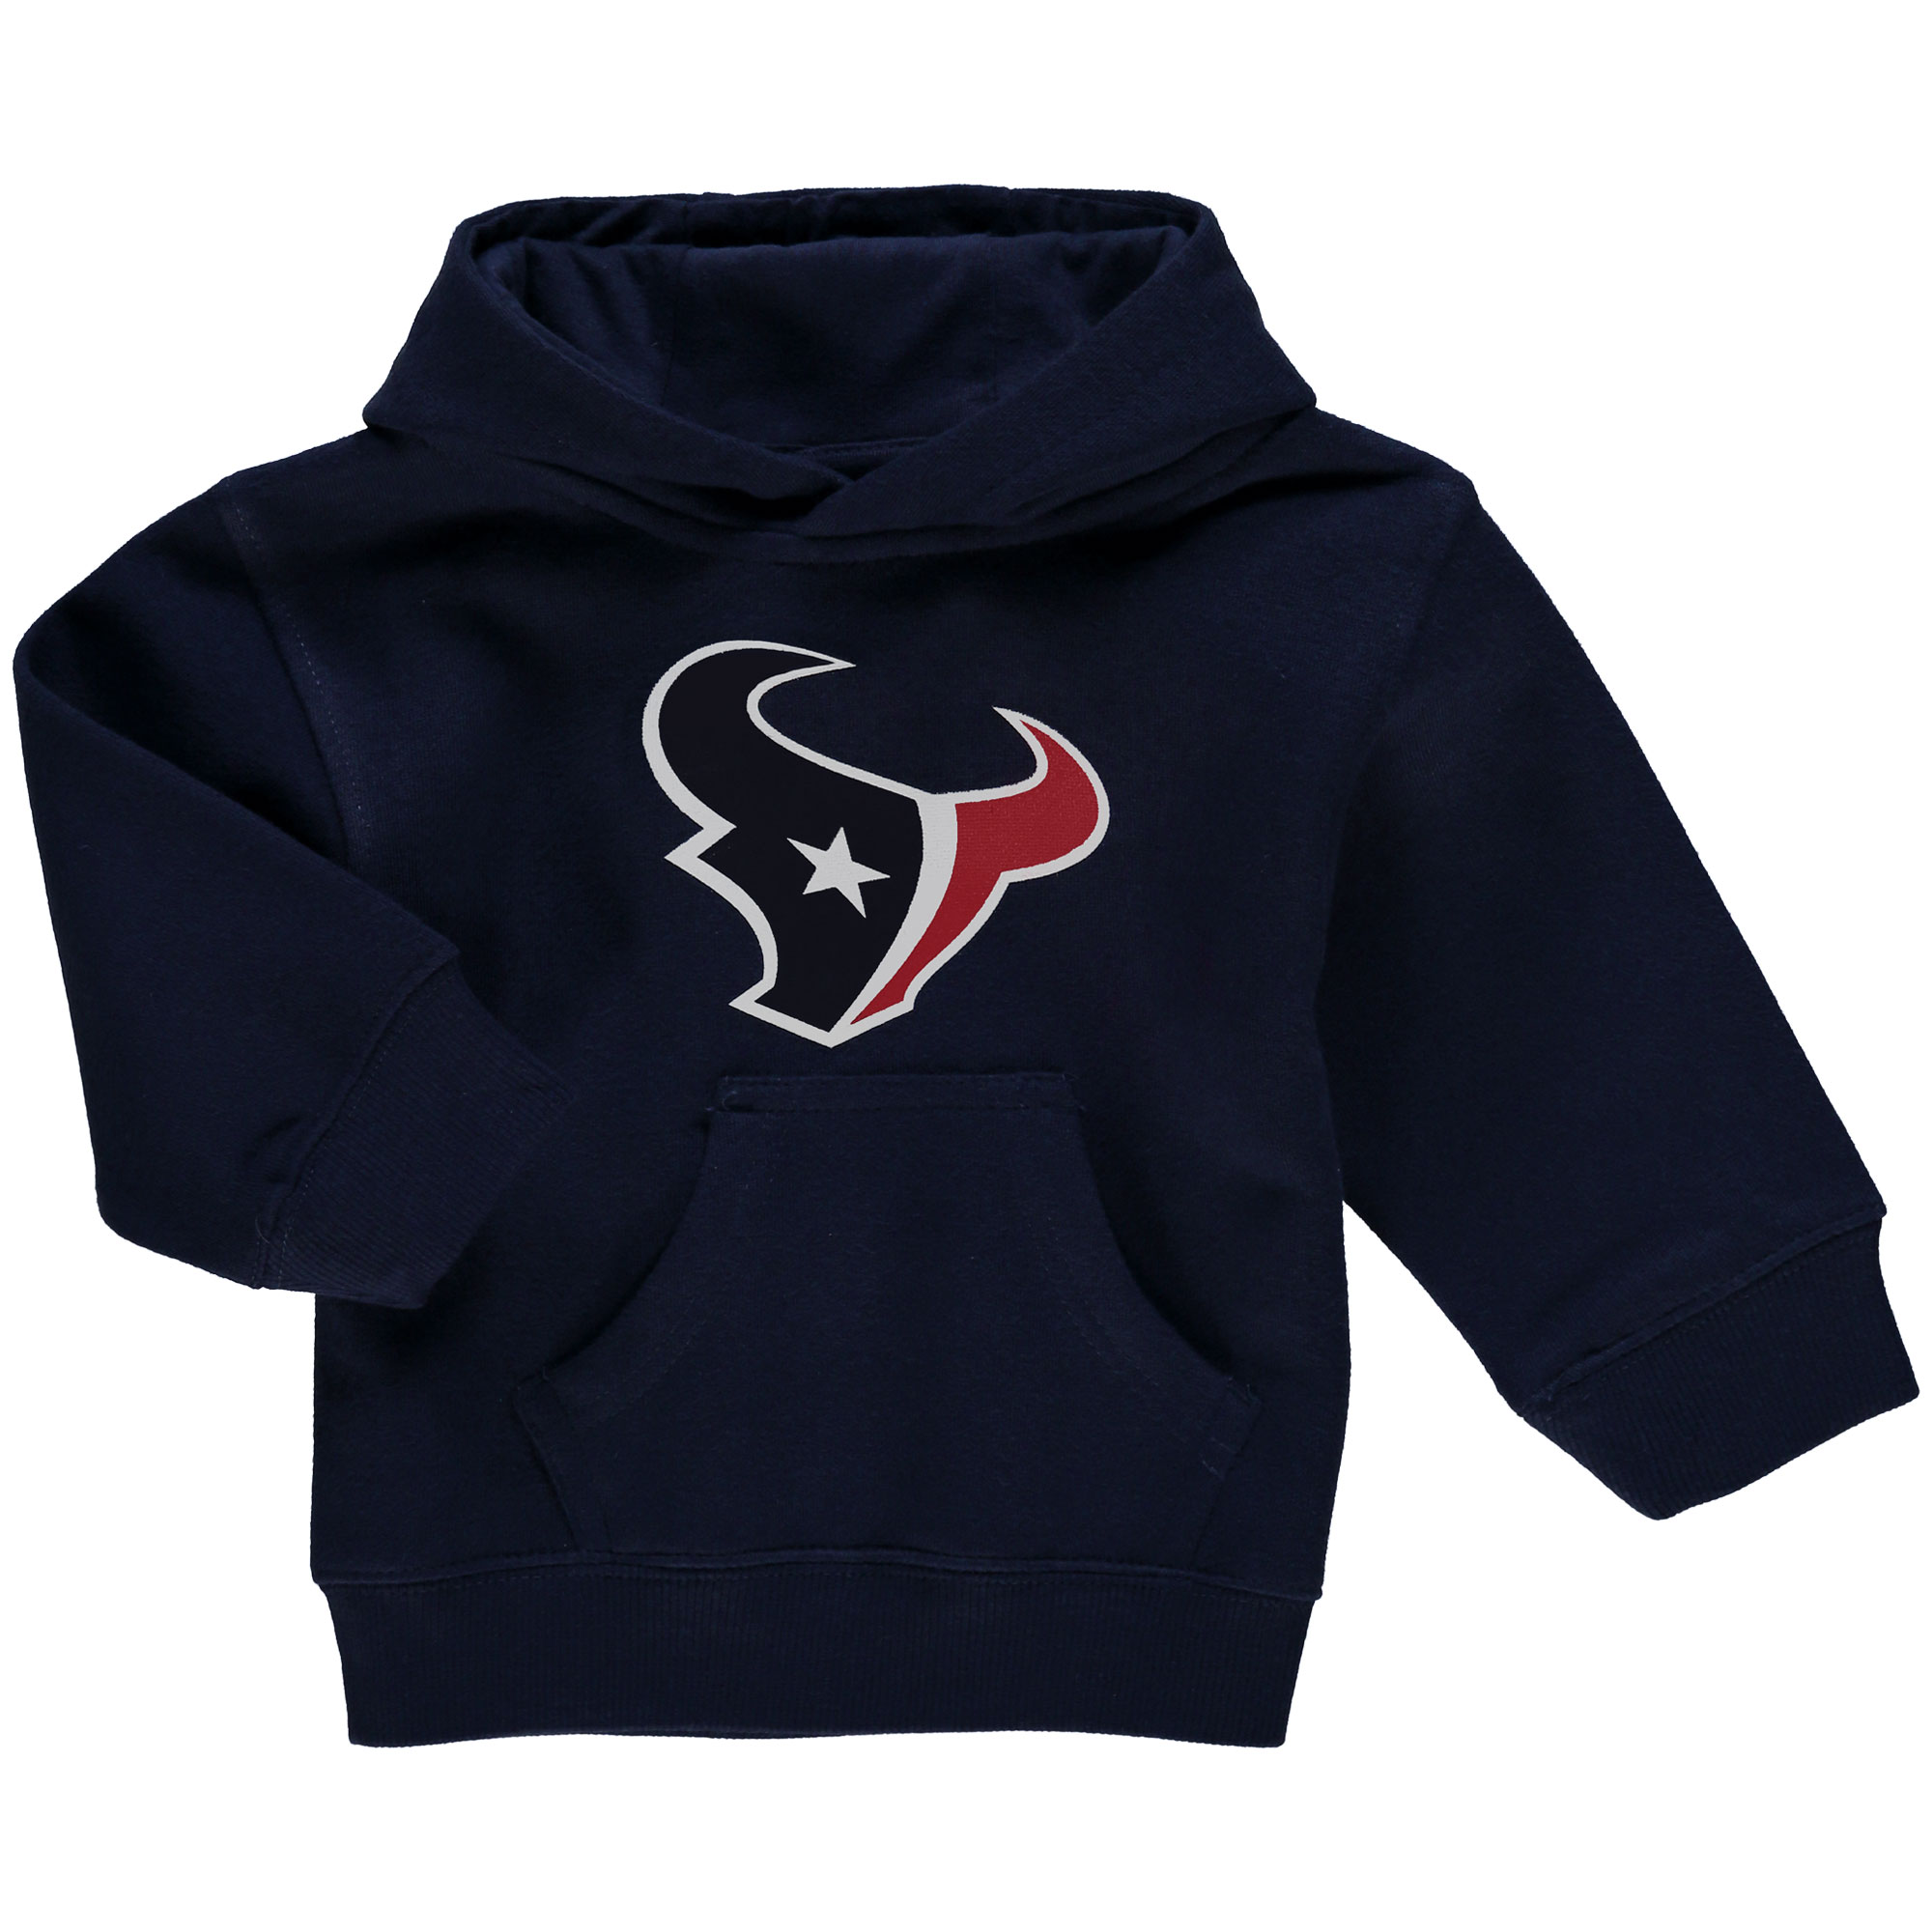 Houston Texans Toddler Team Logo Fleece Pullover Hoodie - Navy